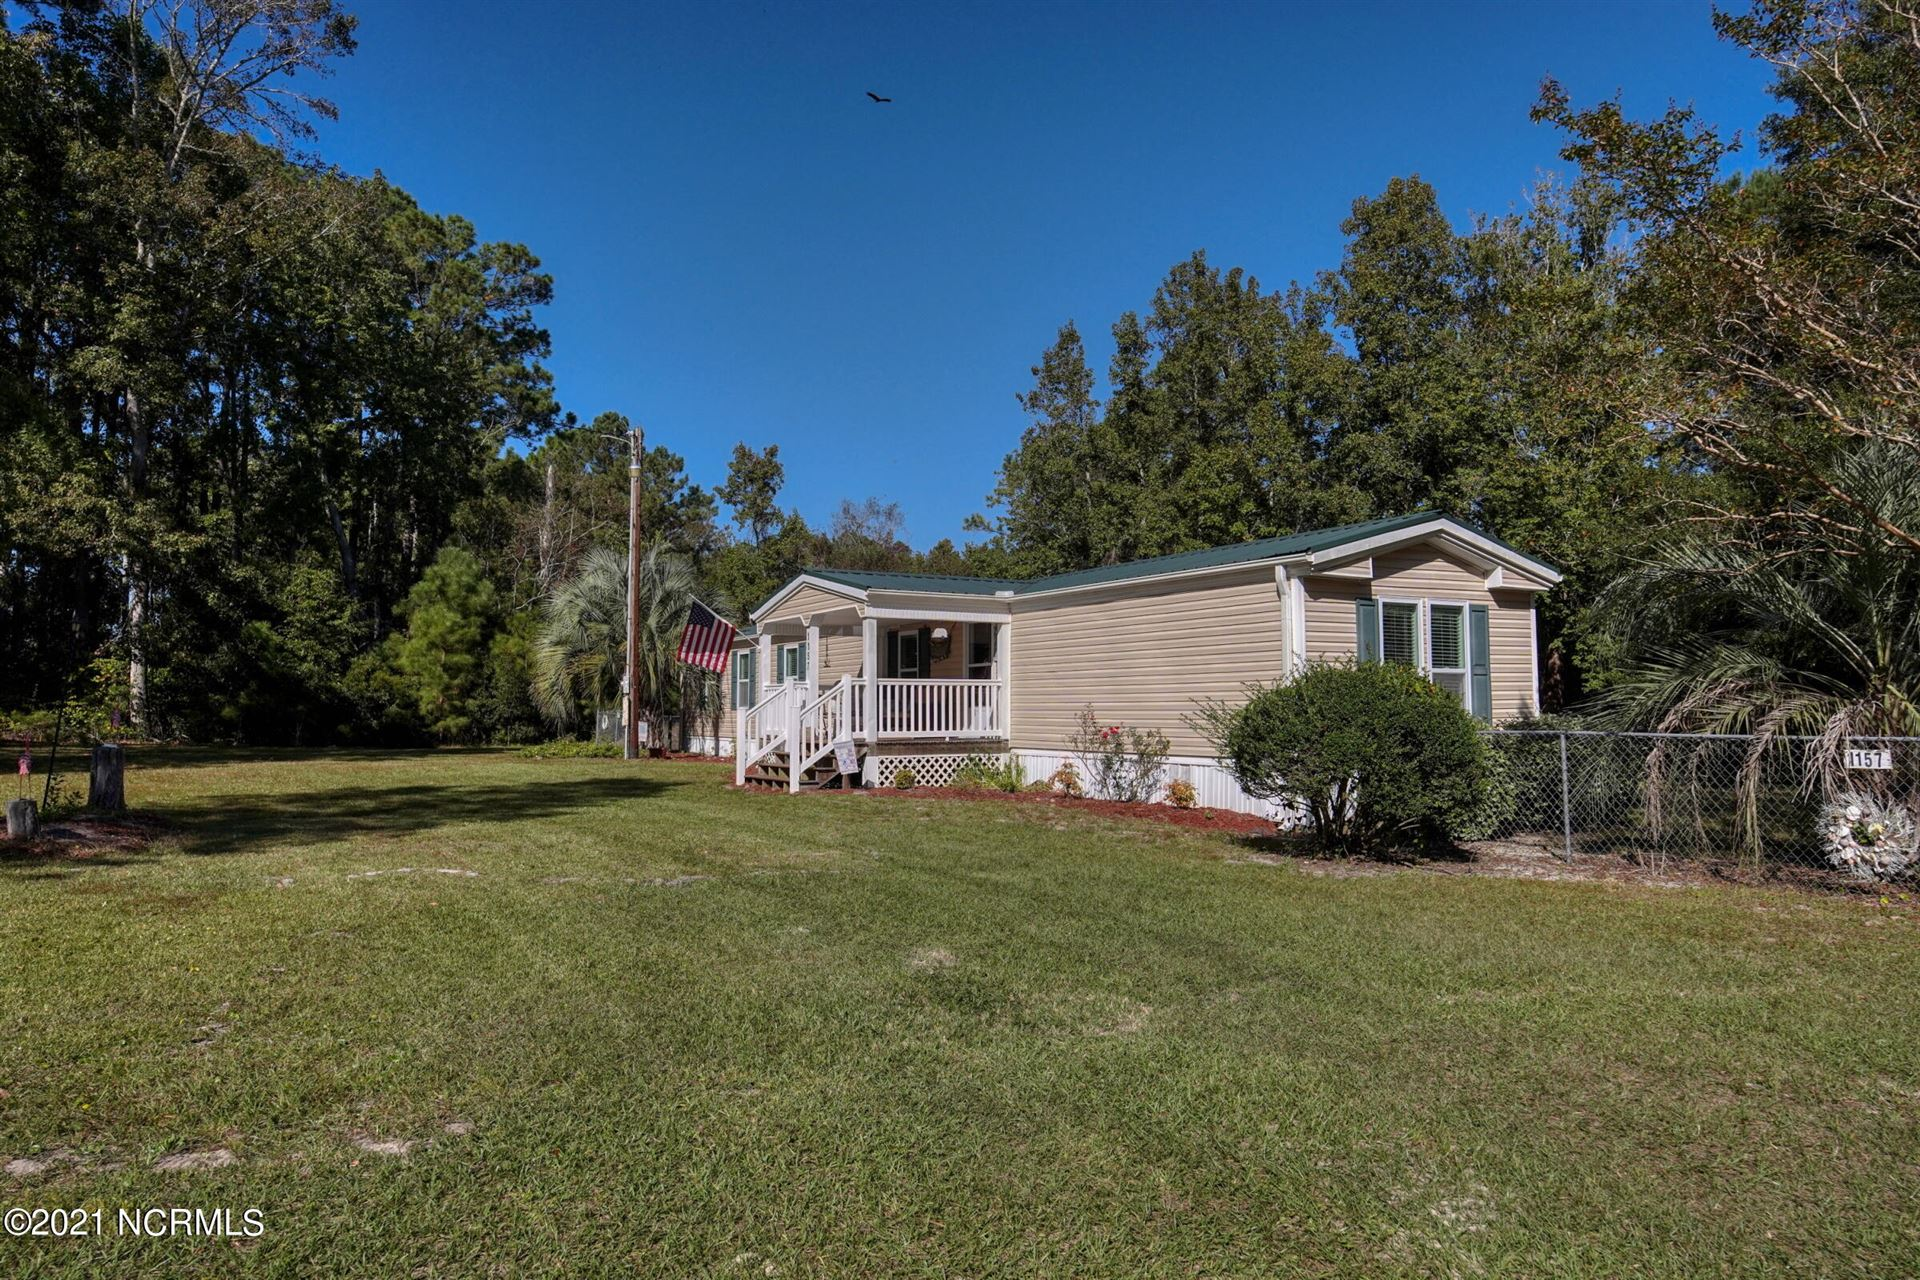 Photo of 1157 Riverview Drive, Calabash, NC 28467 (MLS # 100296600)